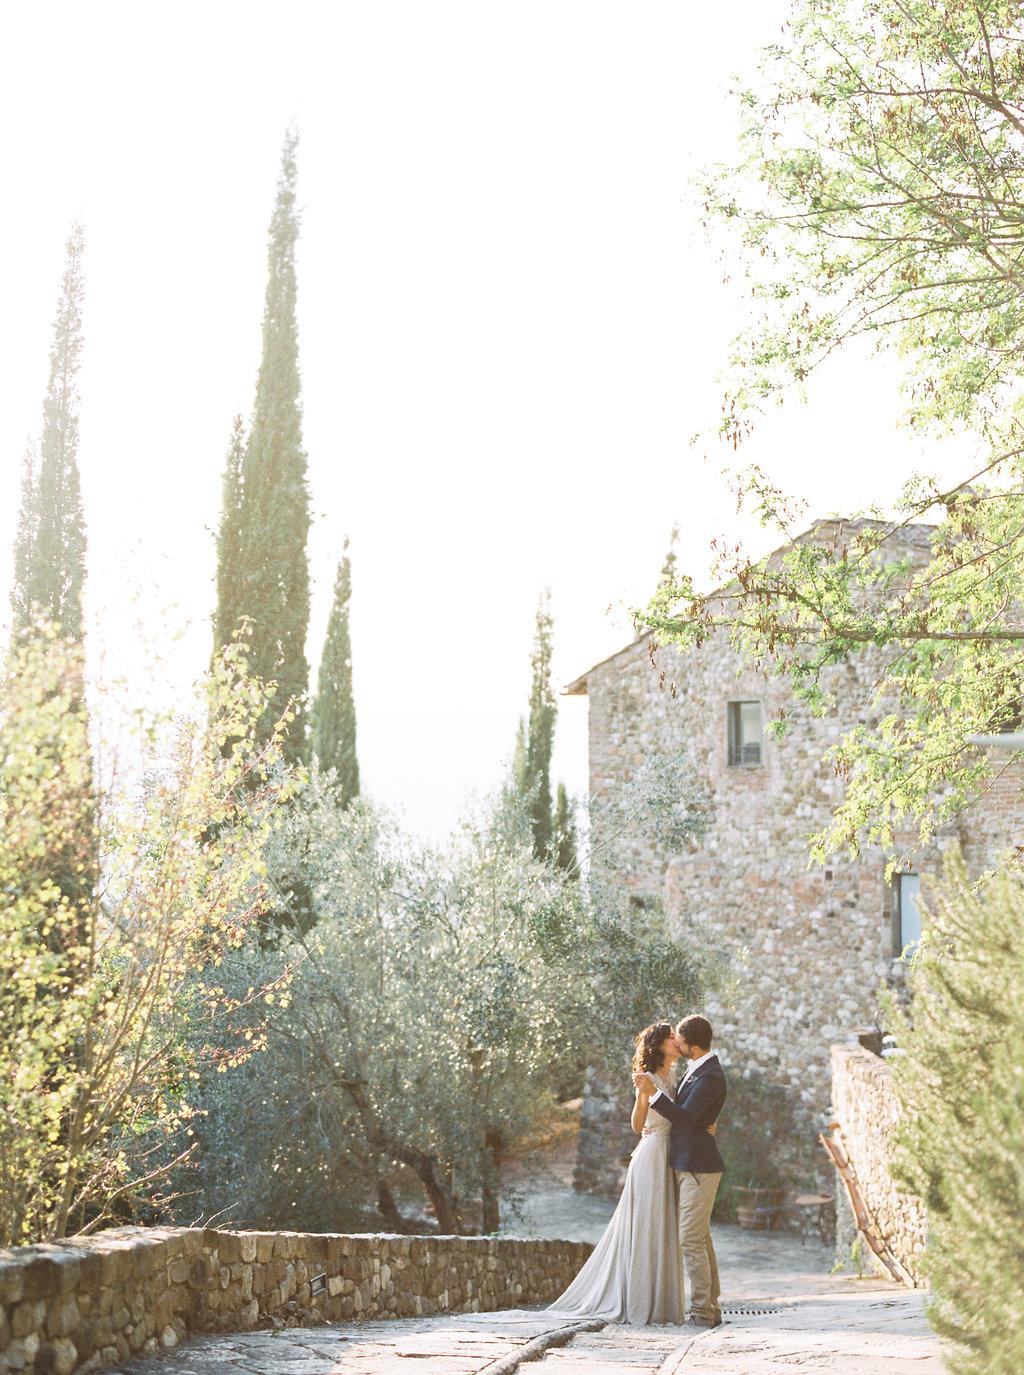 castello-updates-3